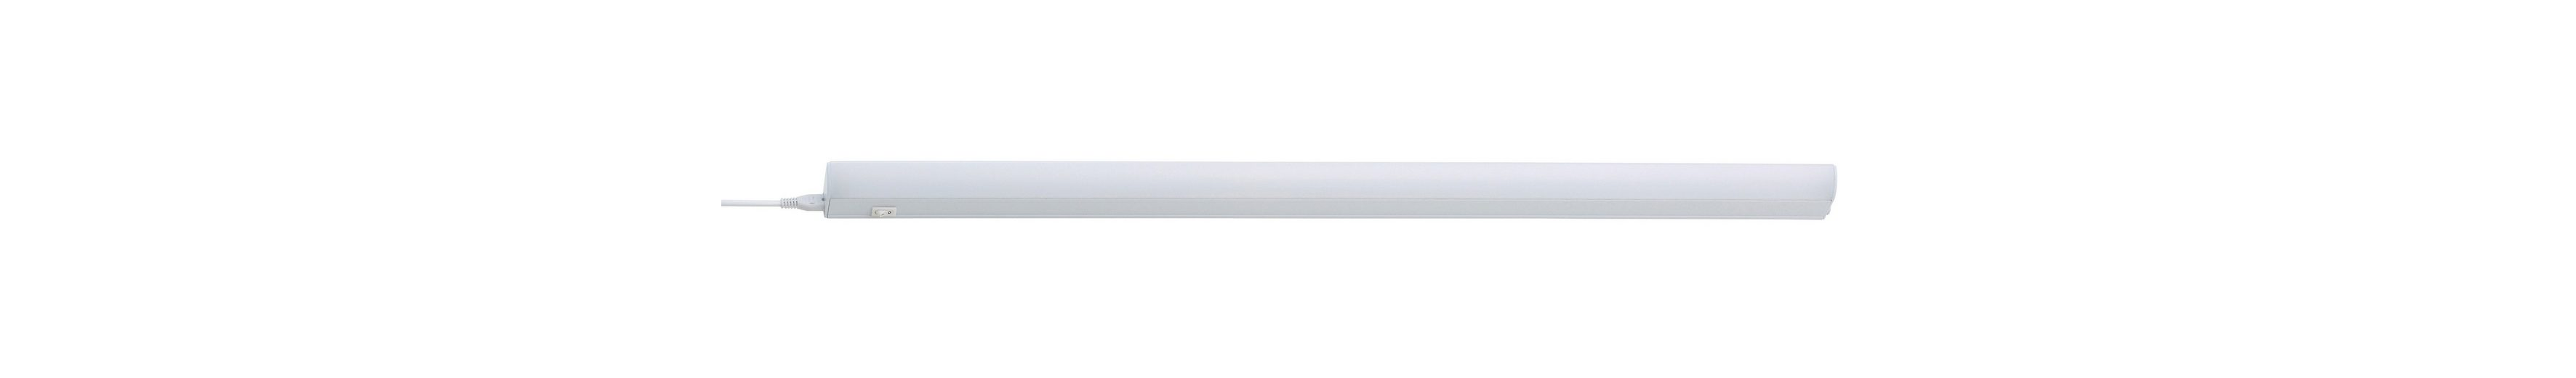 LED Unterbauleuchte »Cook & Light«, 15,6W